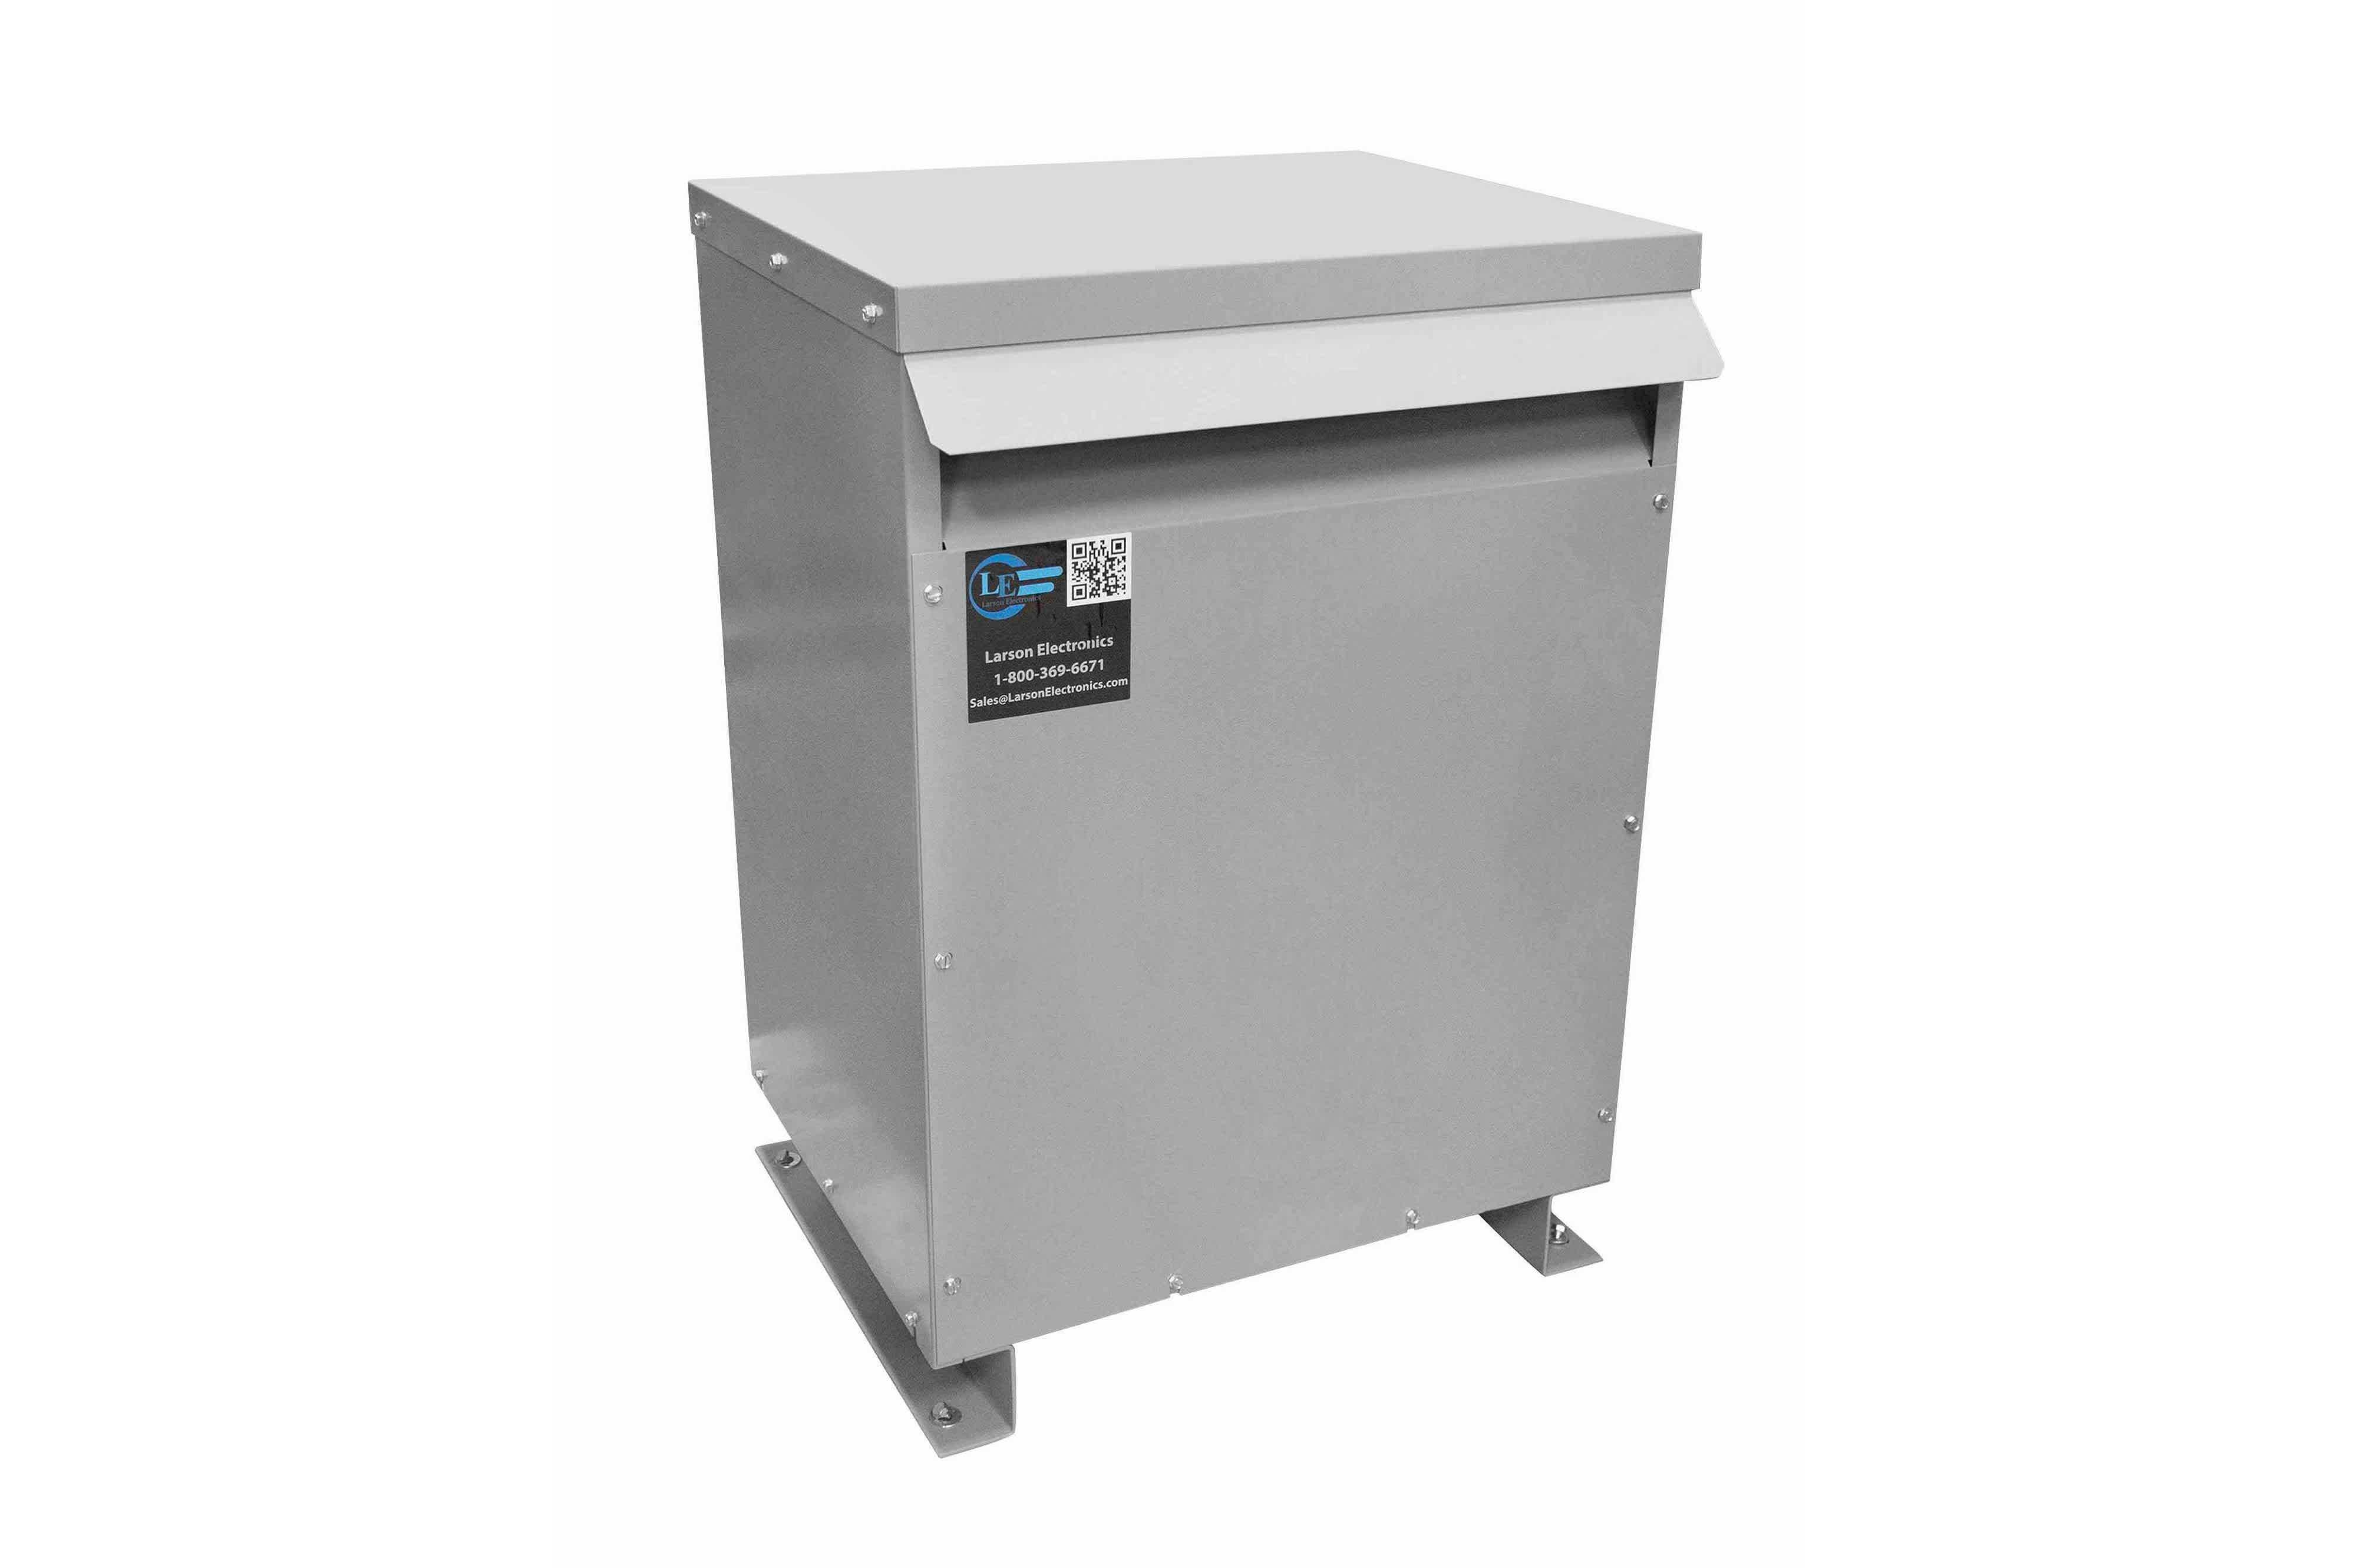 27 kVA 3PH Isolation Transformer, 480V Wye Primary, 415V Delta Secondary, N3R, Ventilated, 60 Hz